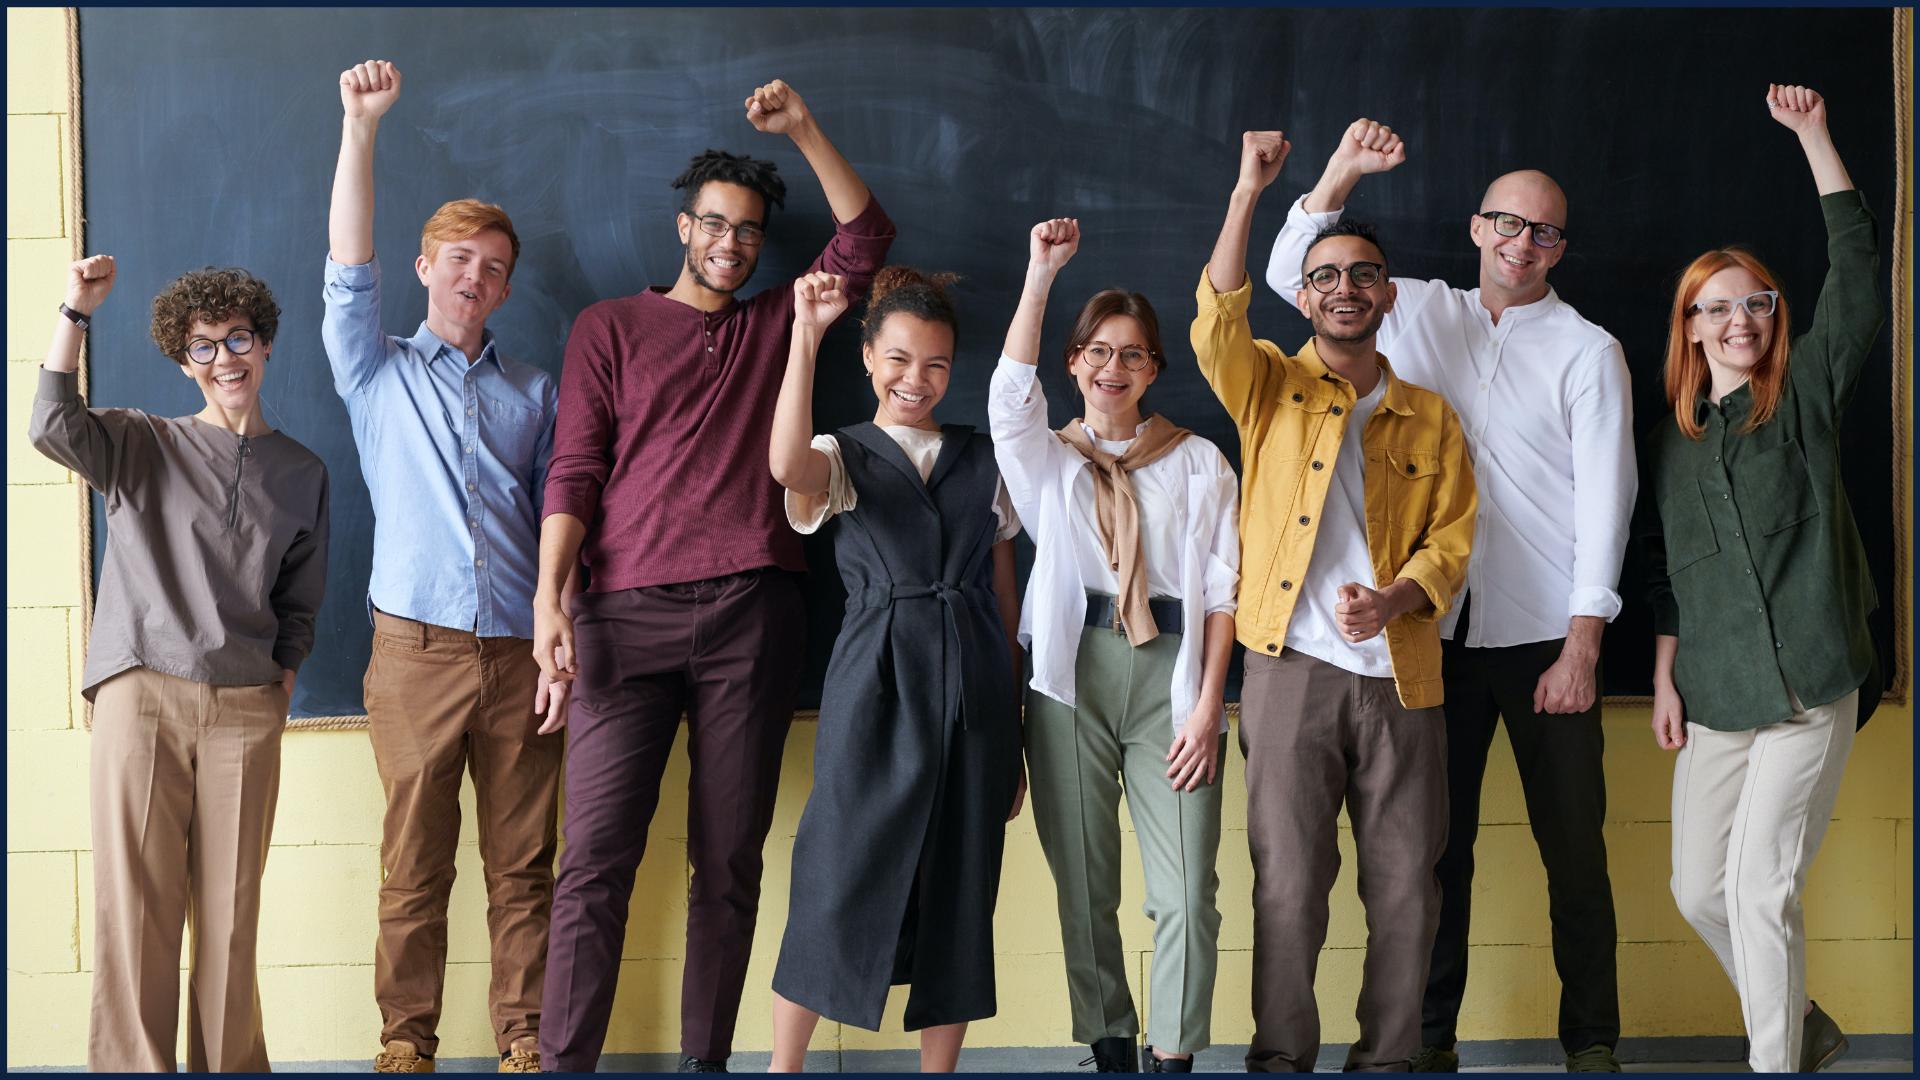 Group of People Standing in front of Blackboard